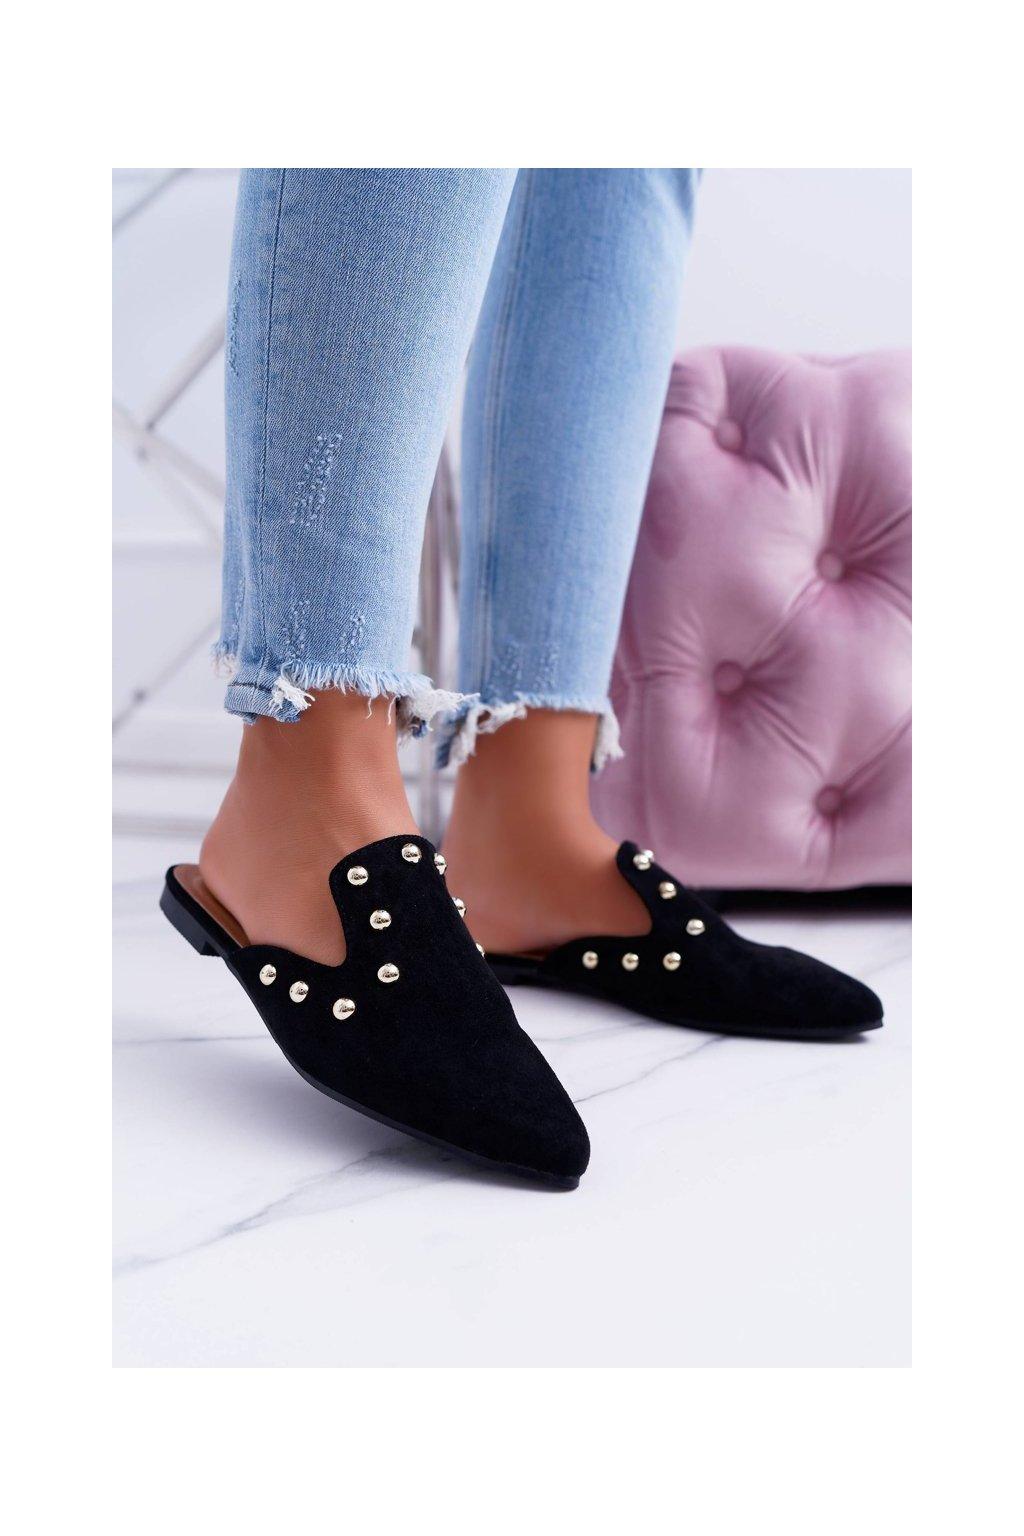 Lu Boo dámske papuče Mule Seniorita čierne NJSK 978-A3